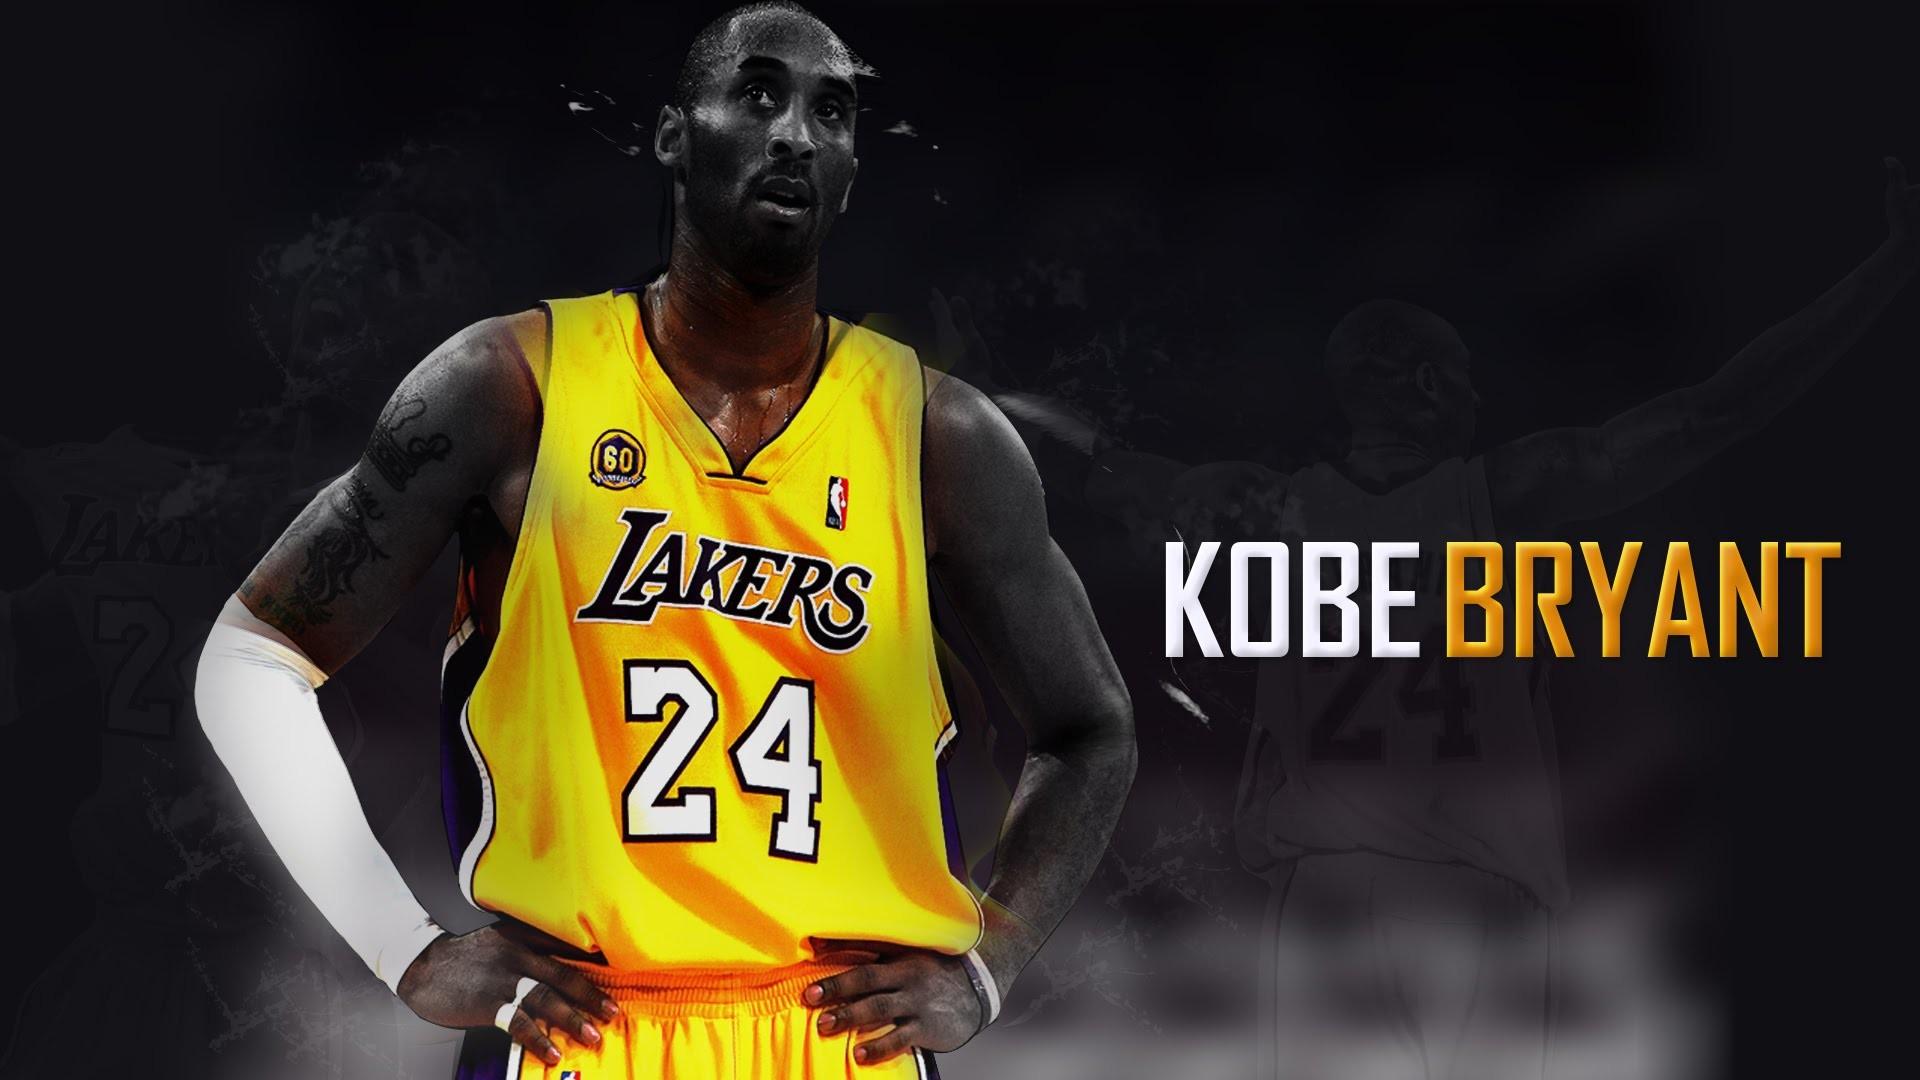 Motivational Wallpaper Quotes Kobe Kobe Bryant 24 Wallpaper 77 Images